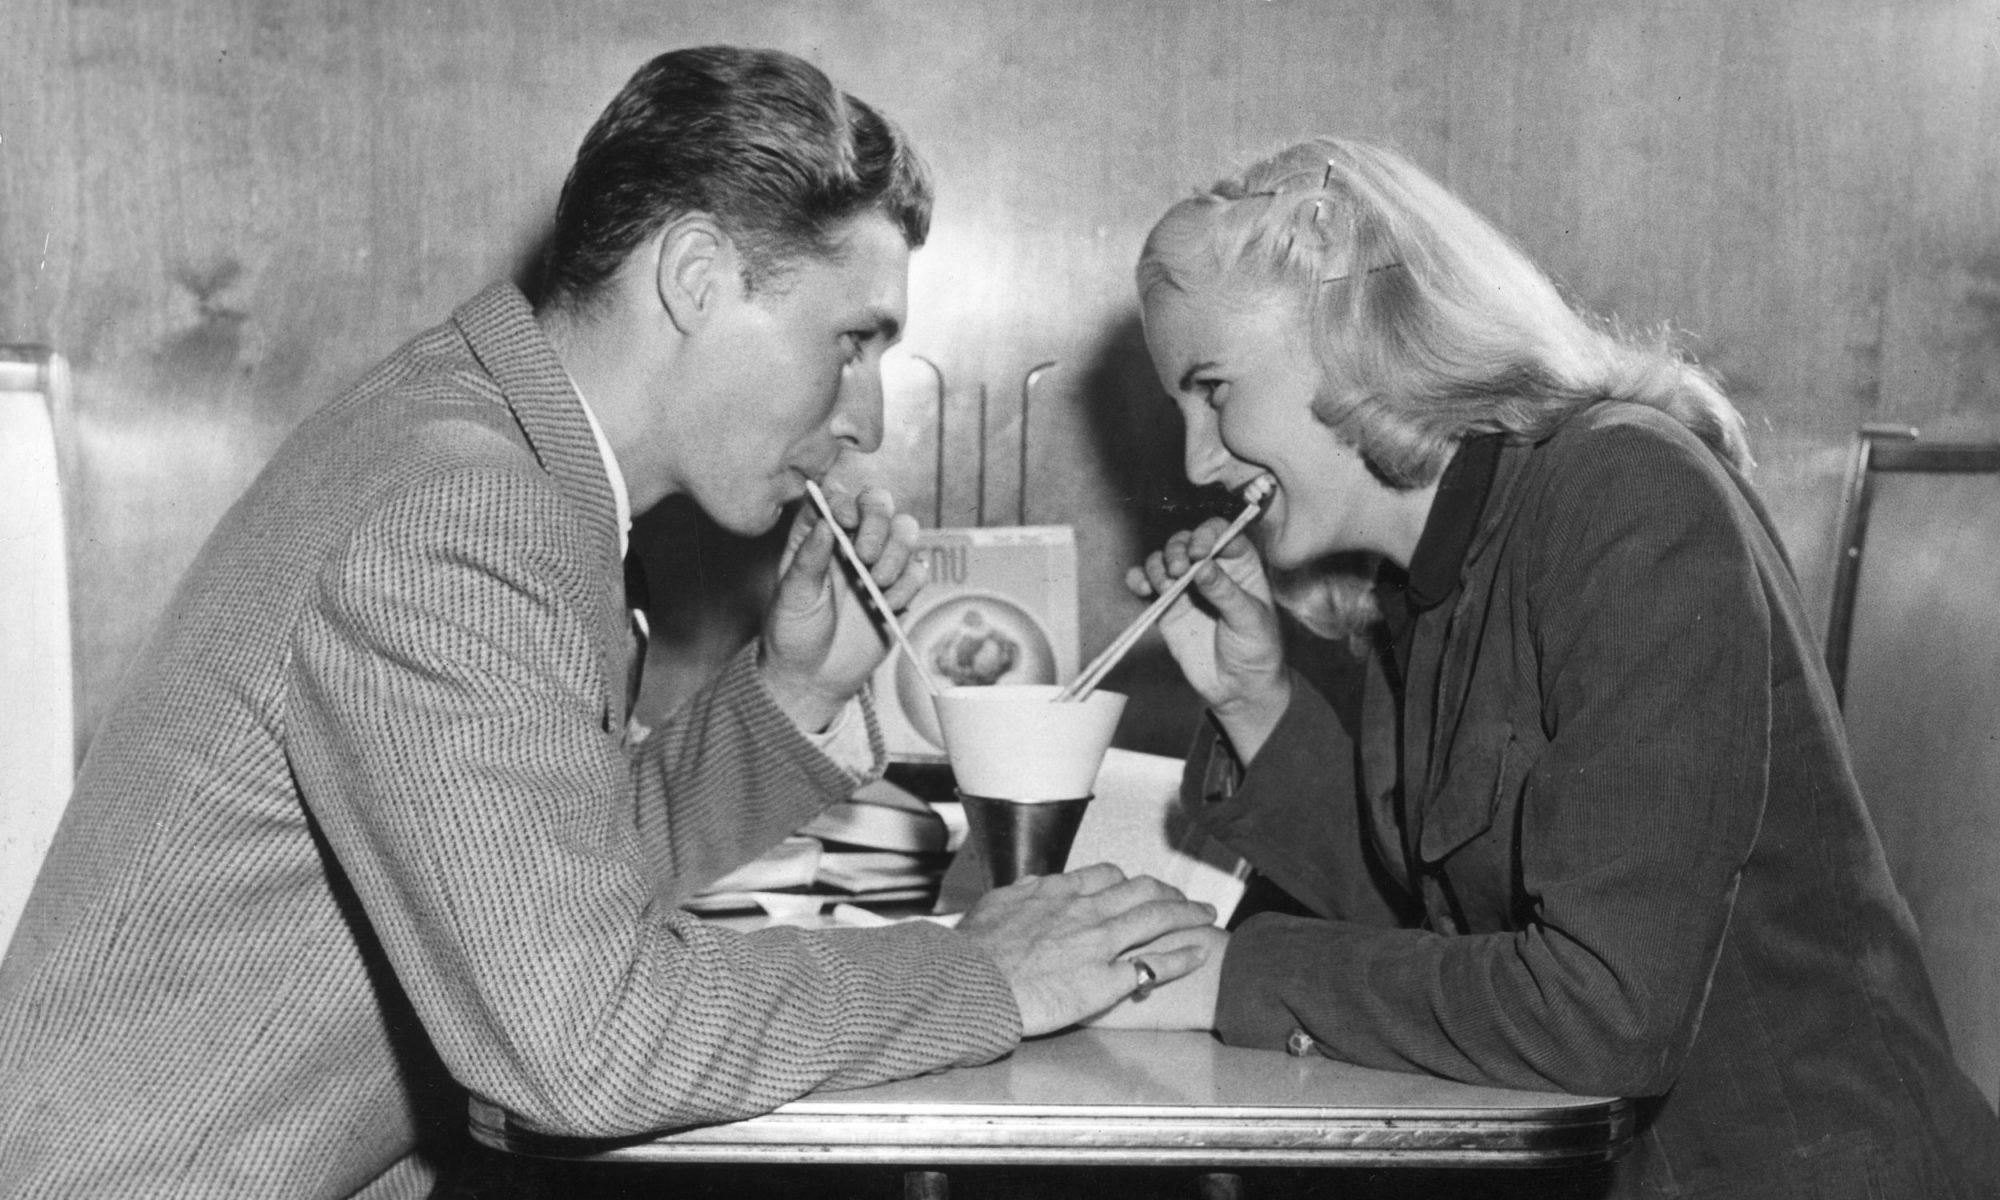 EC: My Parents Fell in Love Cooking Diner Breakfast